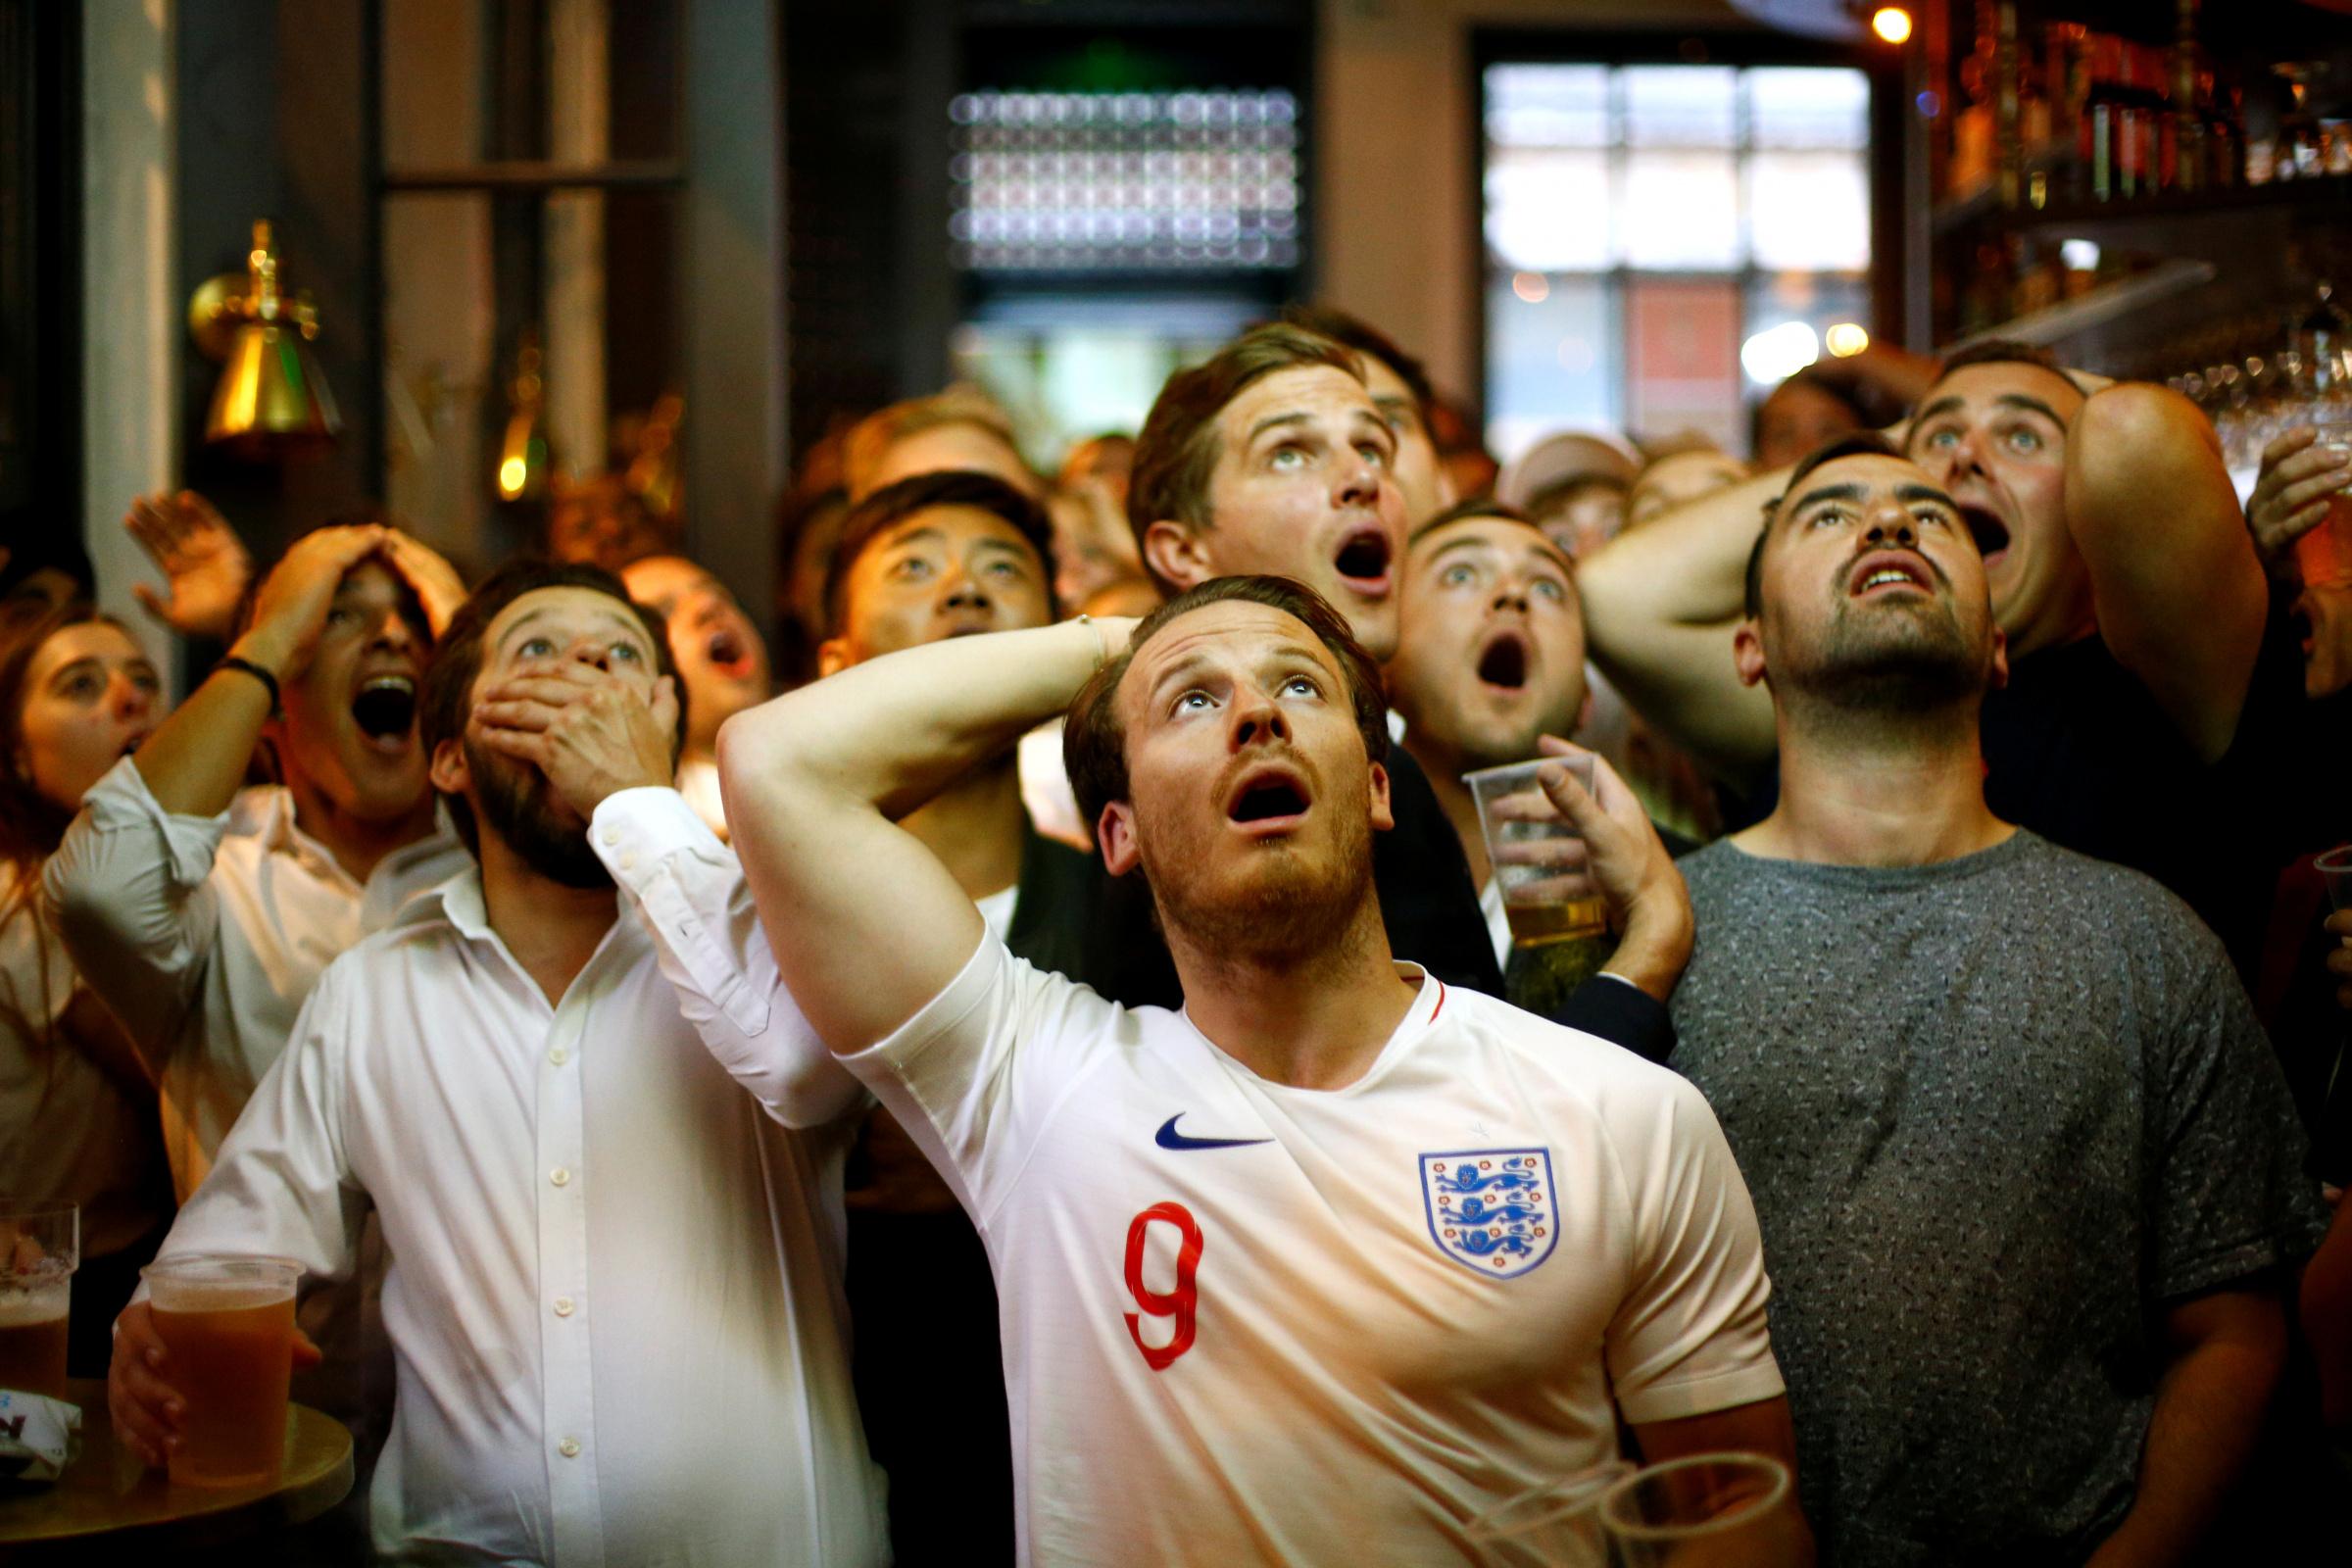 Inglismaa jalgpallifännid. Foto: REUTERS/Henry Nicholls